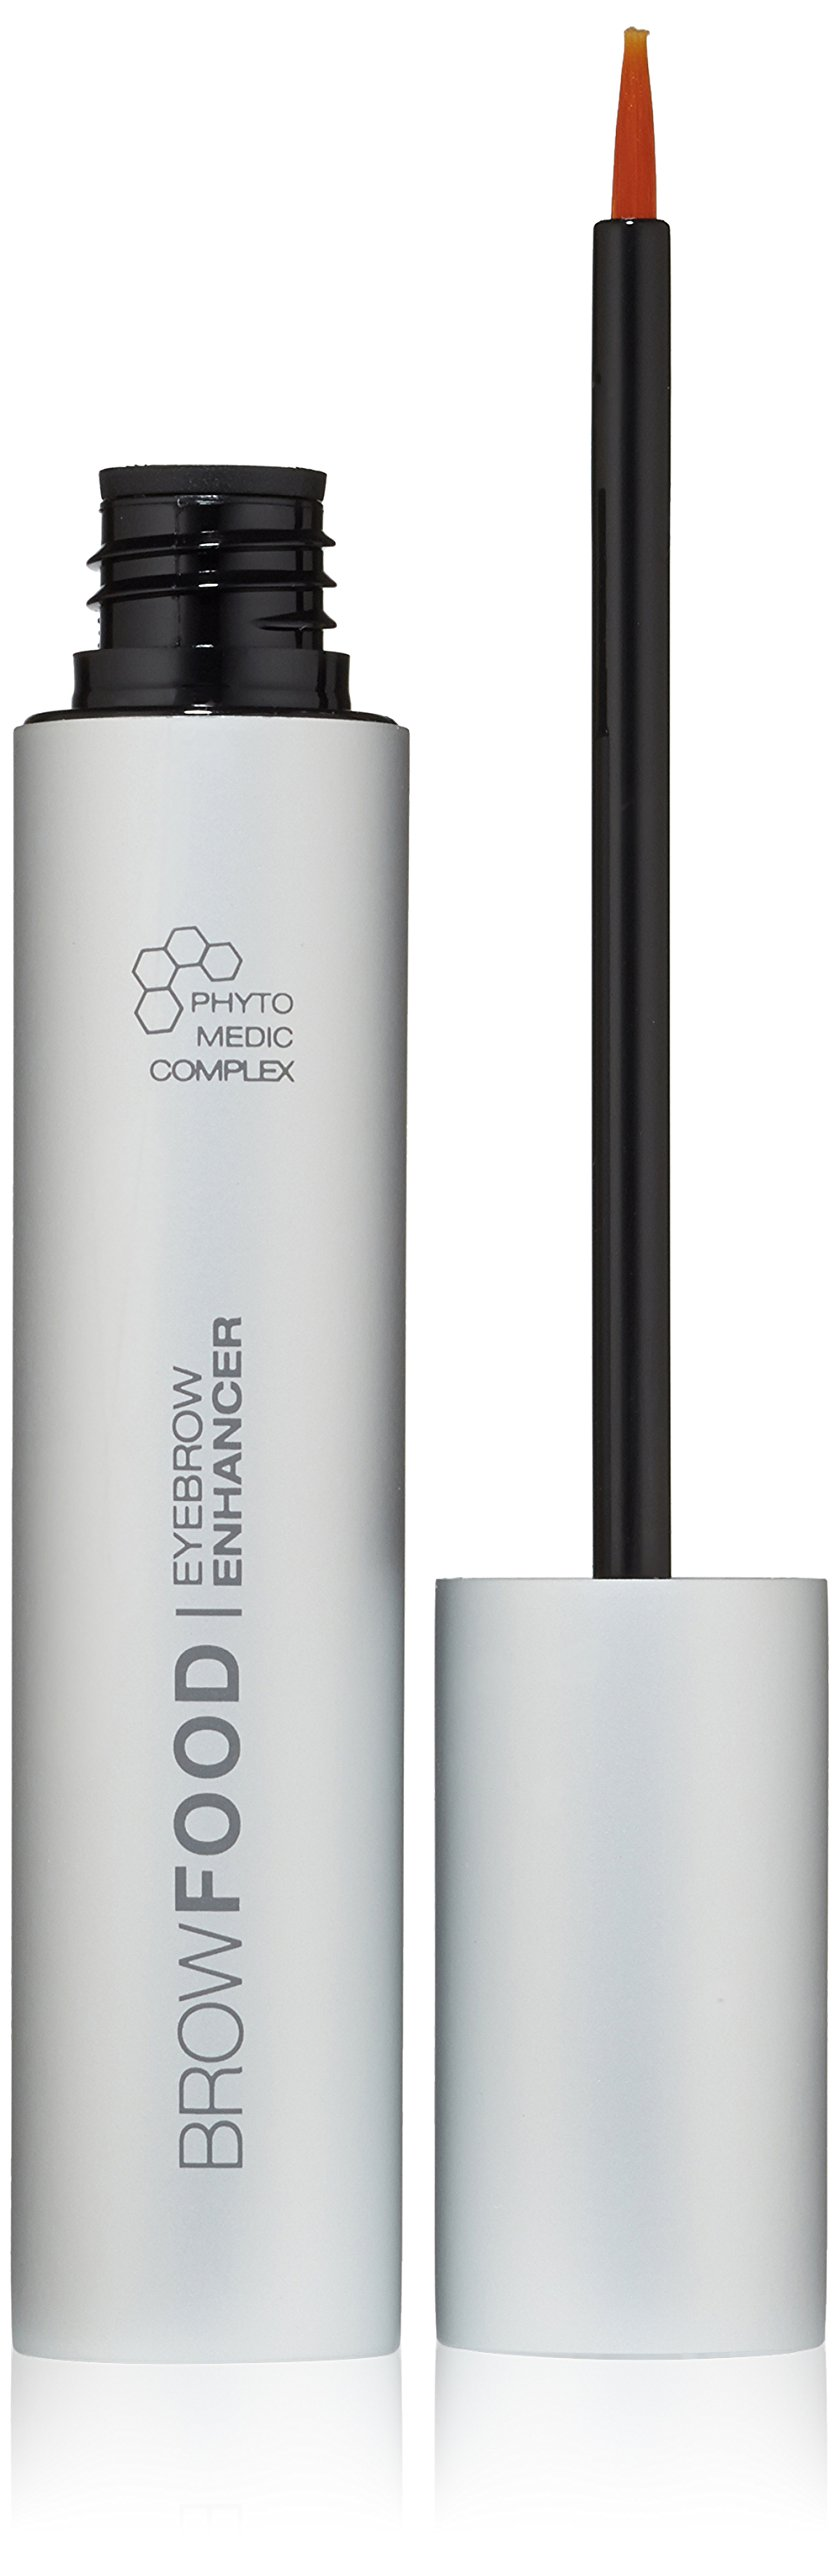 BrowFood Phyto-Medic Eyebrow Enhancer, 0.17 fl. oz.